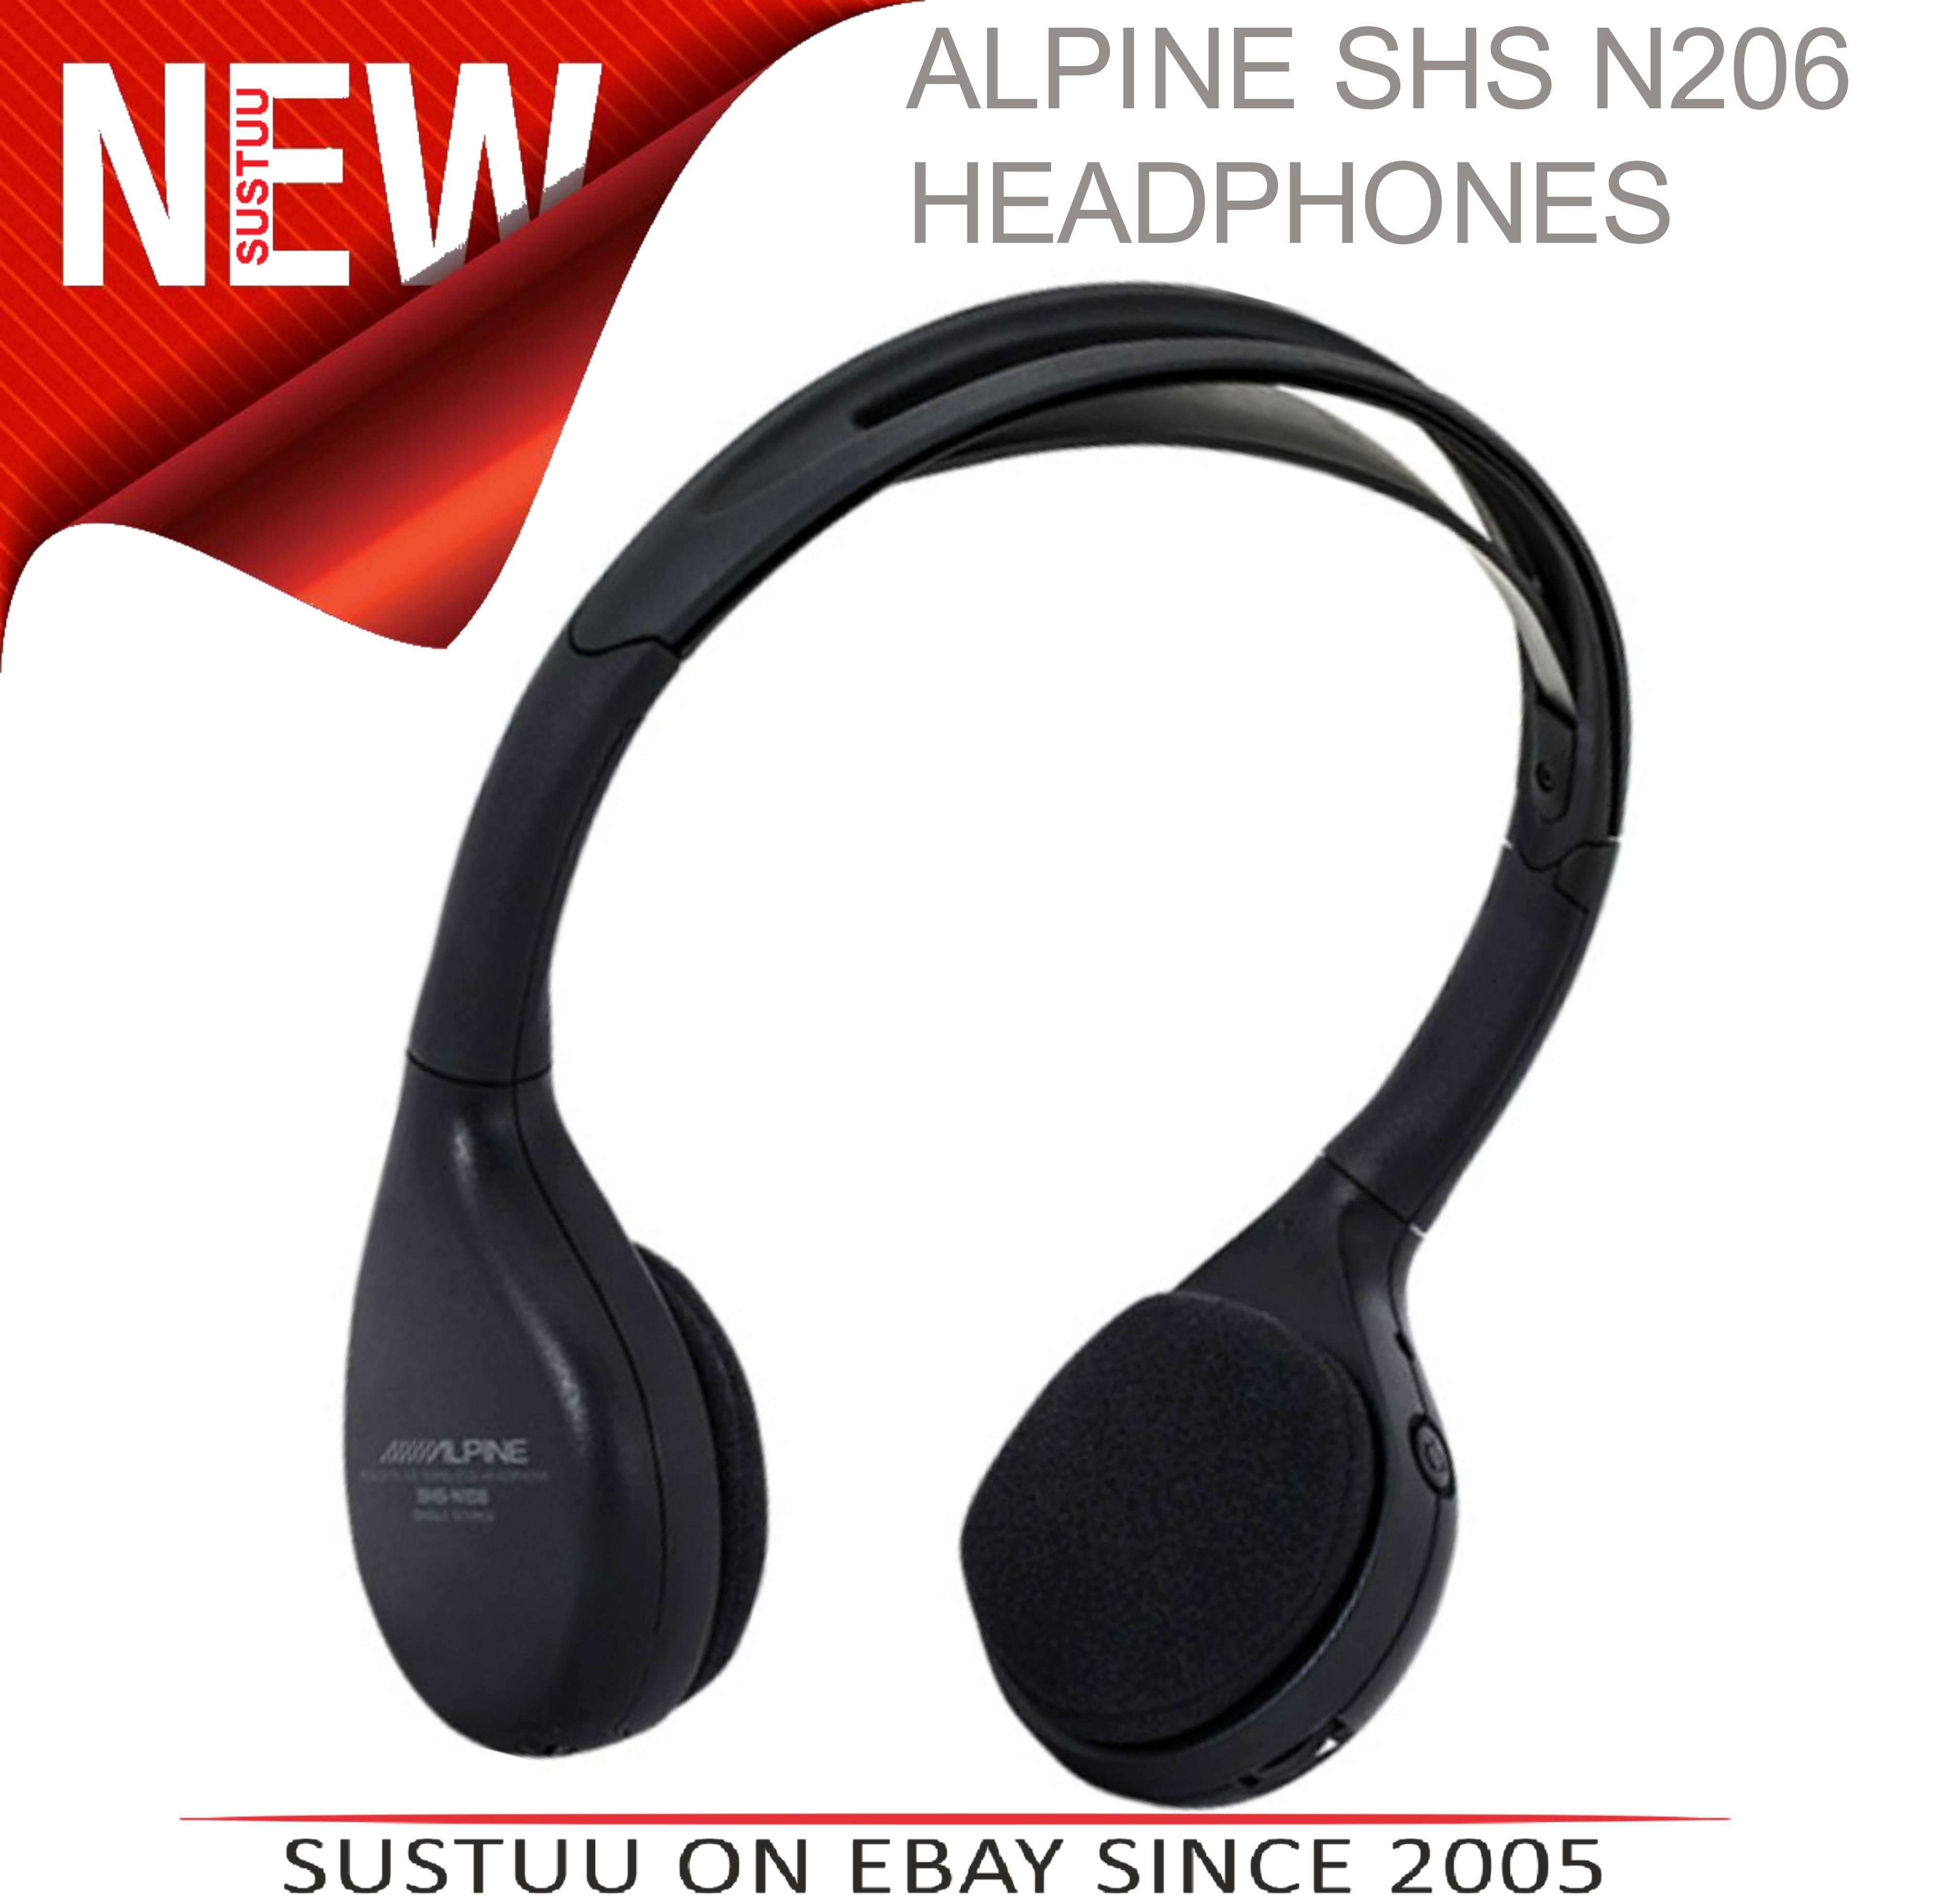 Alpine SHS-N206 Dual Channel Fold-Flat Wireless InfraRed Headphone LED Indicator